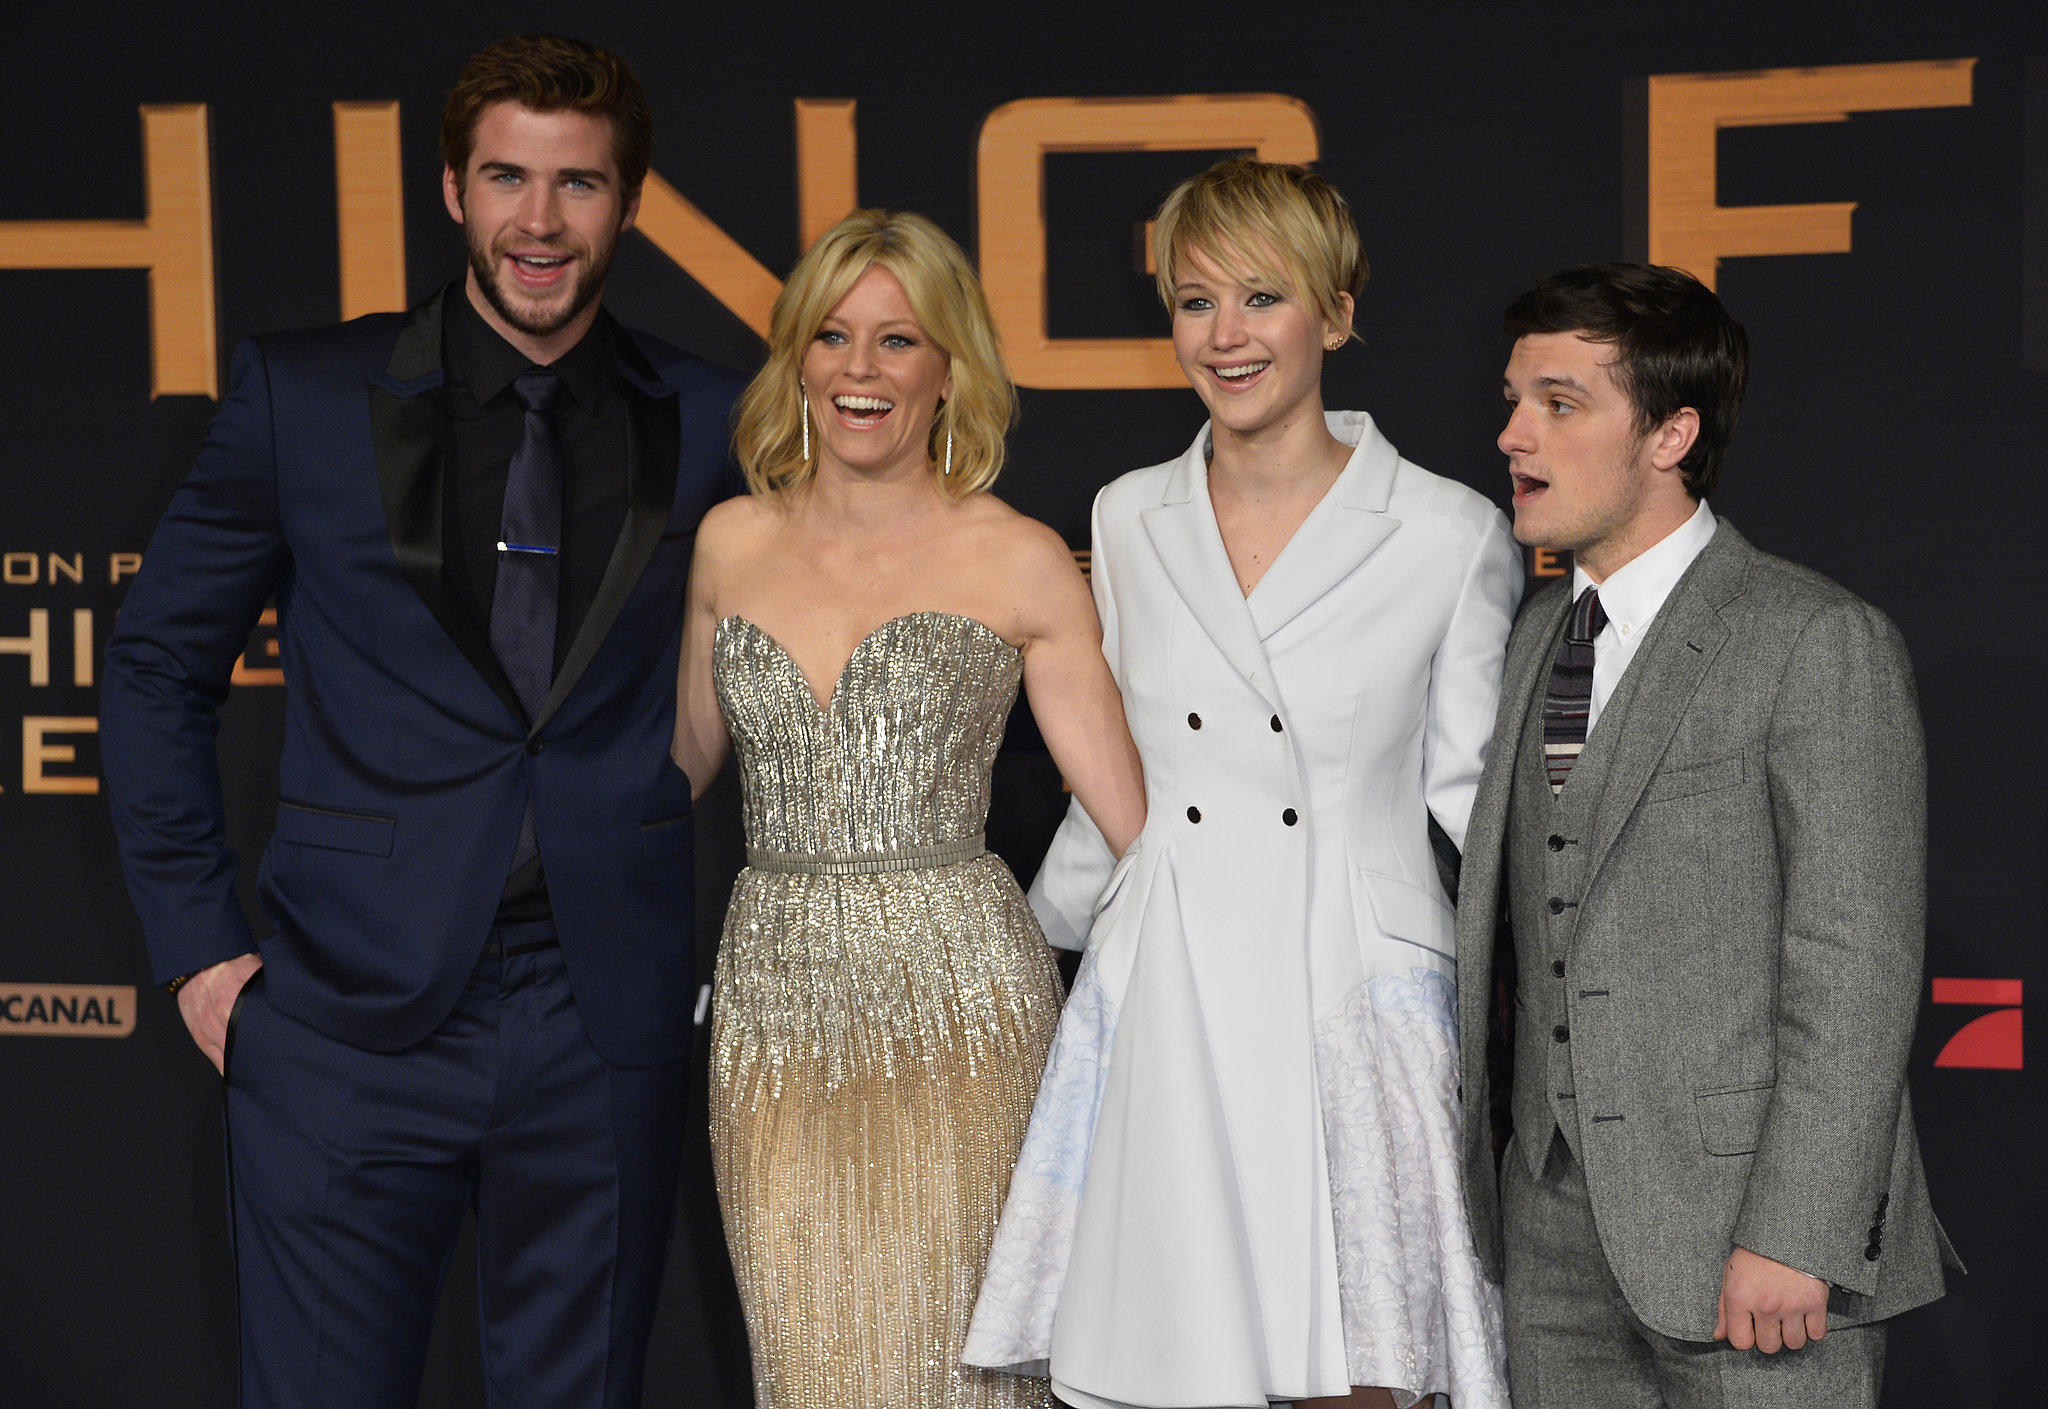 Liam Hemsworth, Jennifer Lawrence, Josh Hutcherson, and Elizabeth Banks all posed for pictures together.